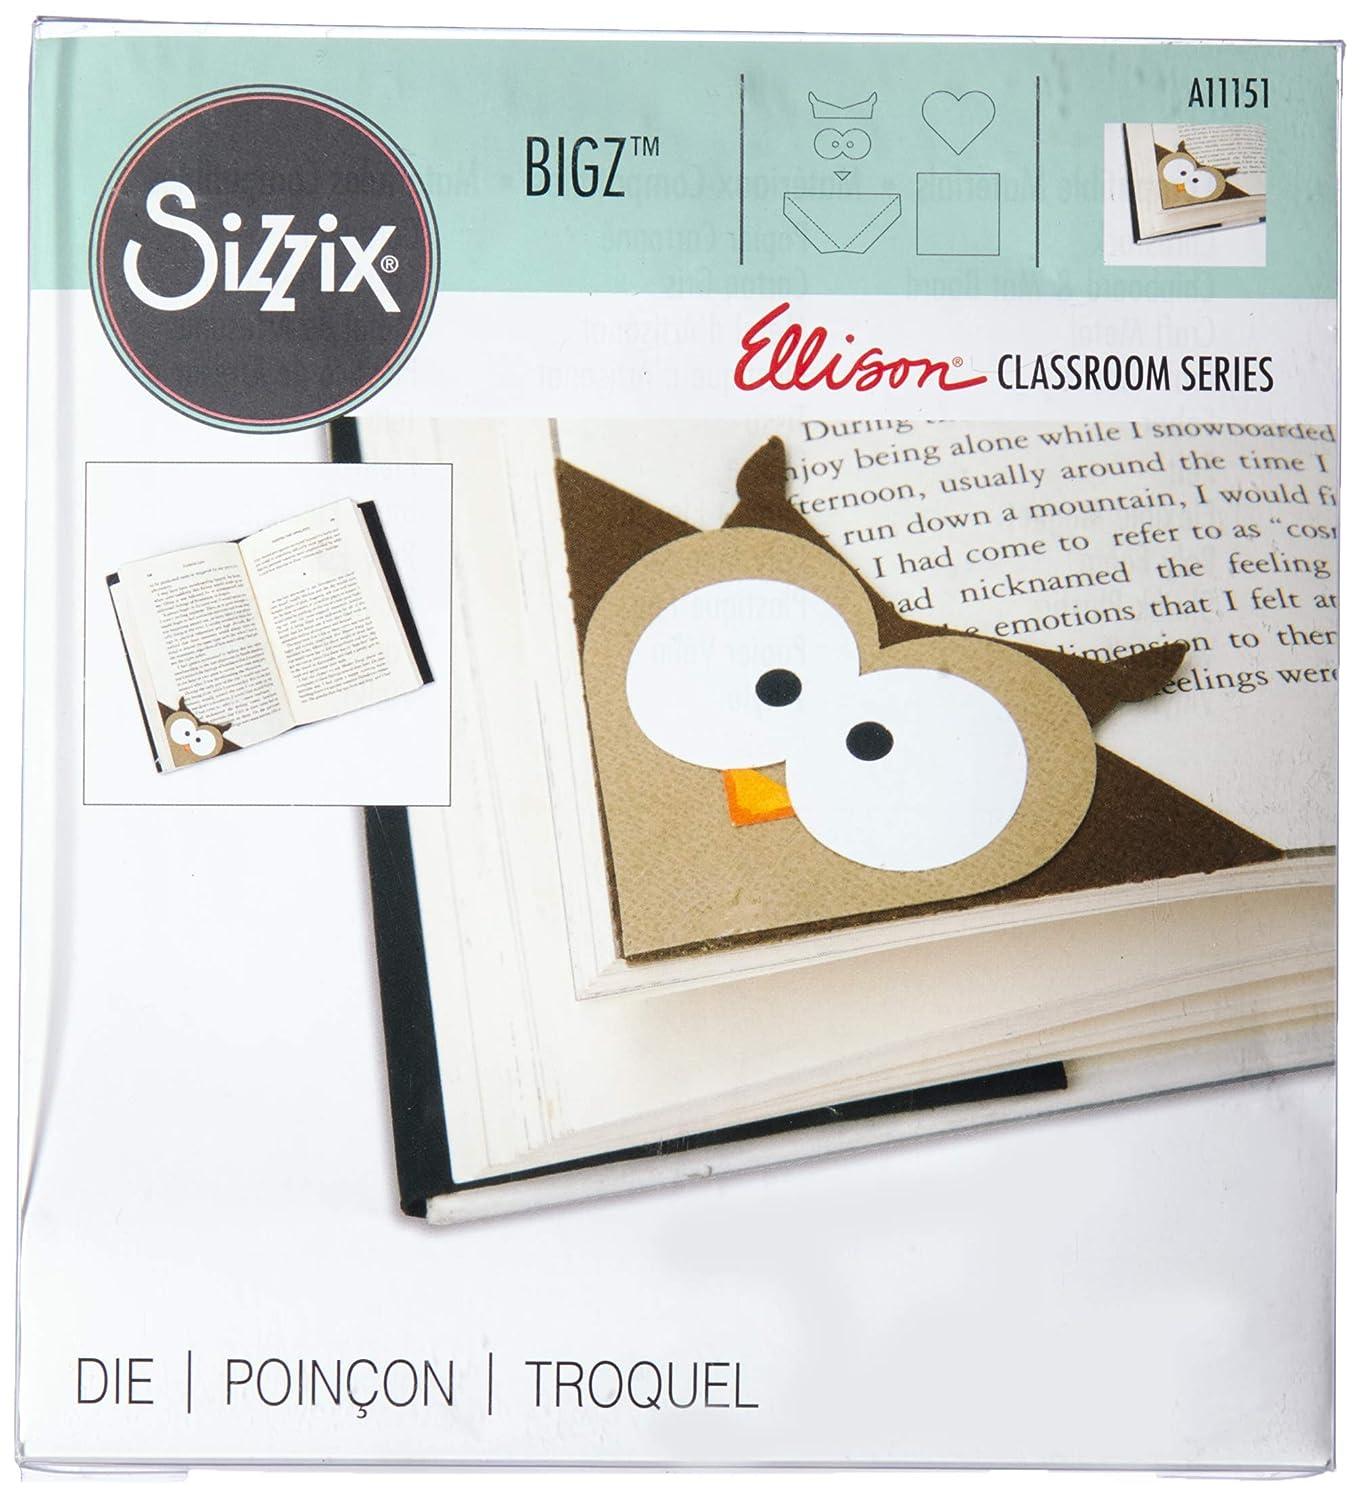 Sizzix A11151 Bigz Die Corner Owl Bookmark